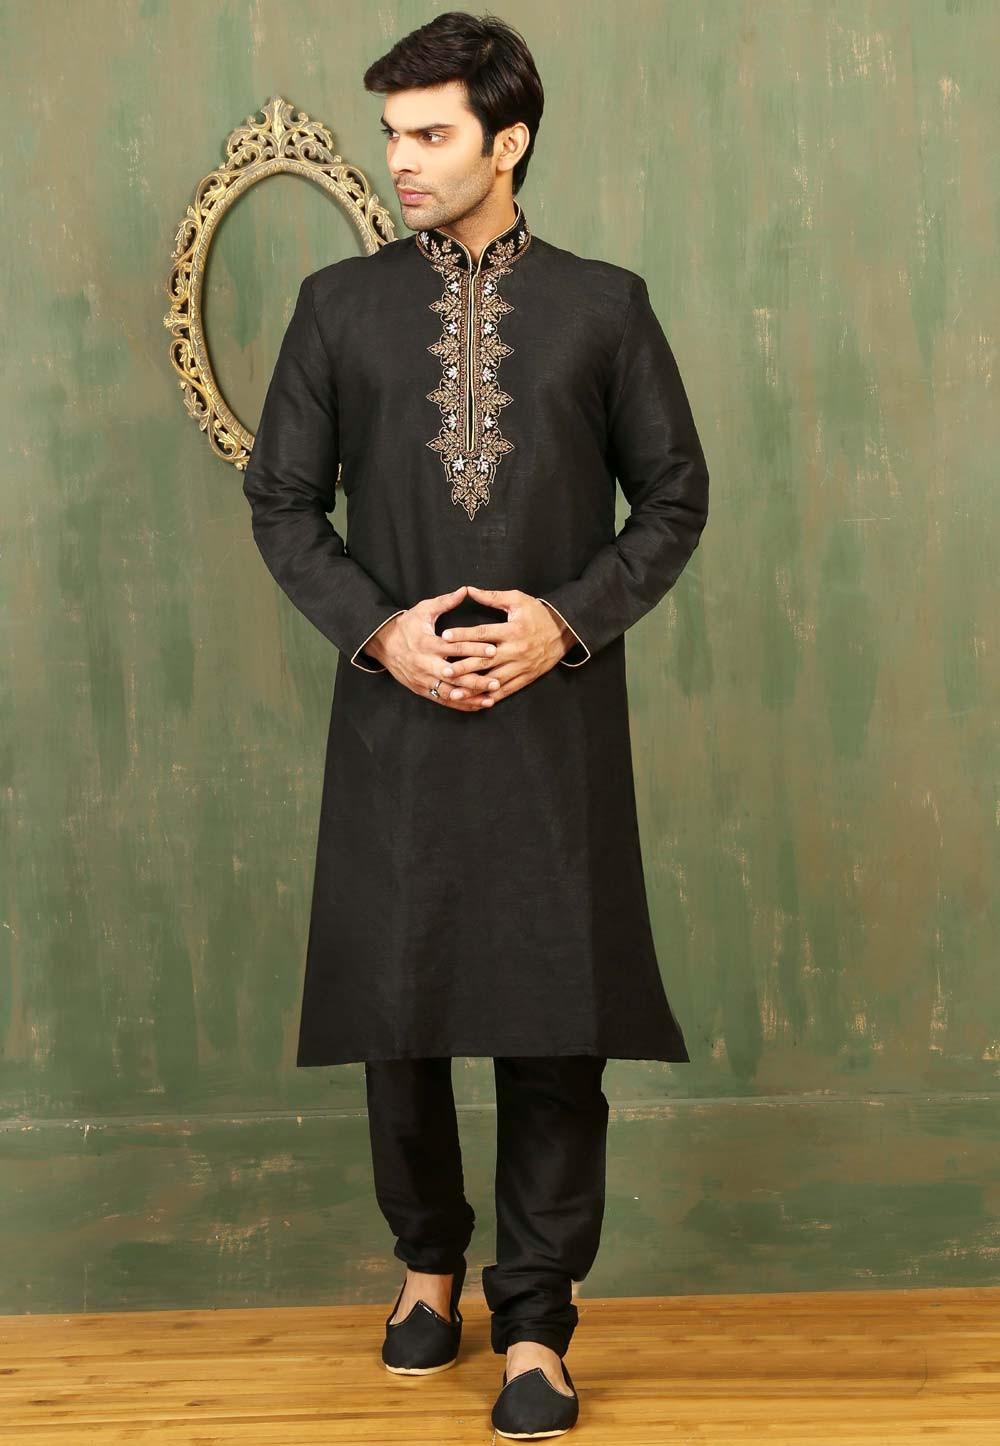 Exquisite Embroidered & Black Color Men's Readymade Kurta Pajama.